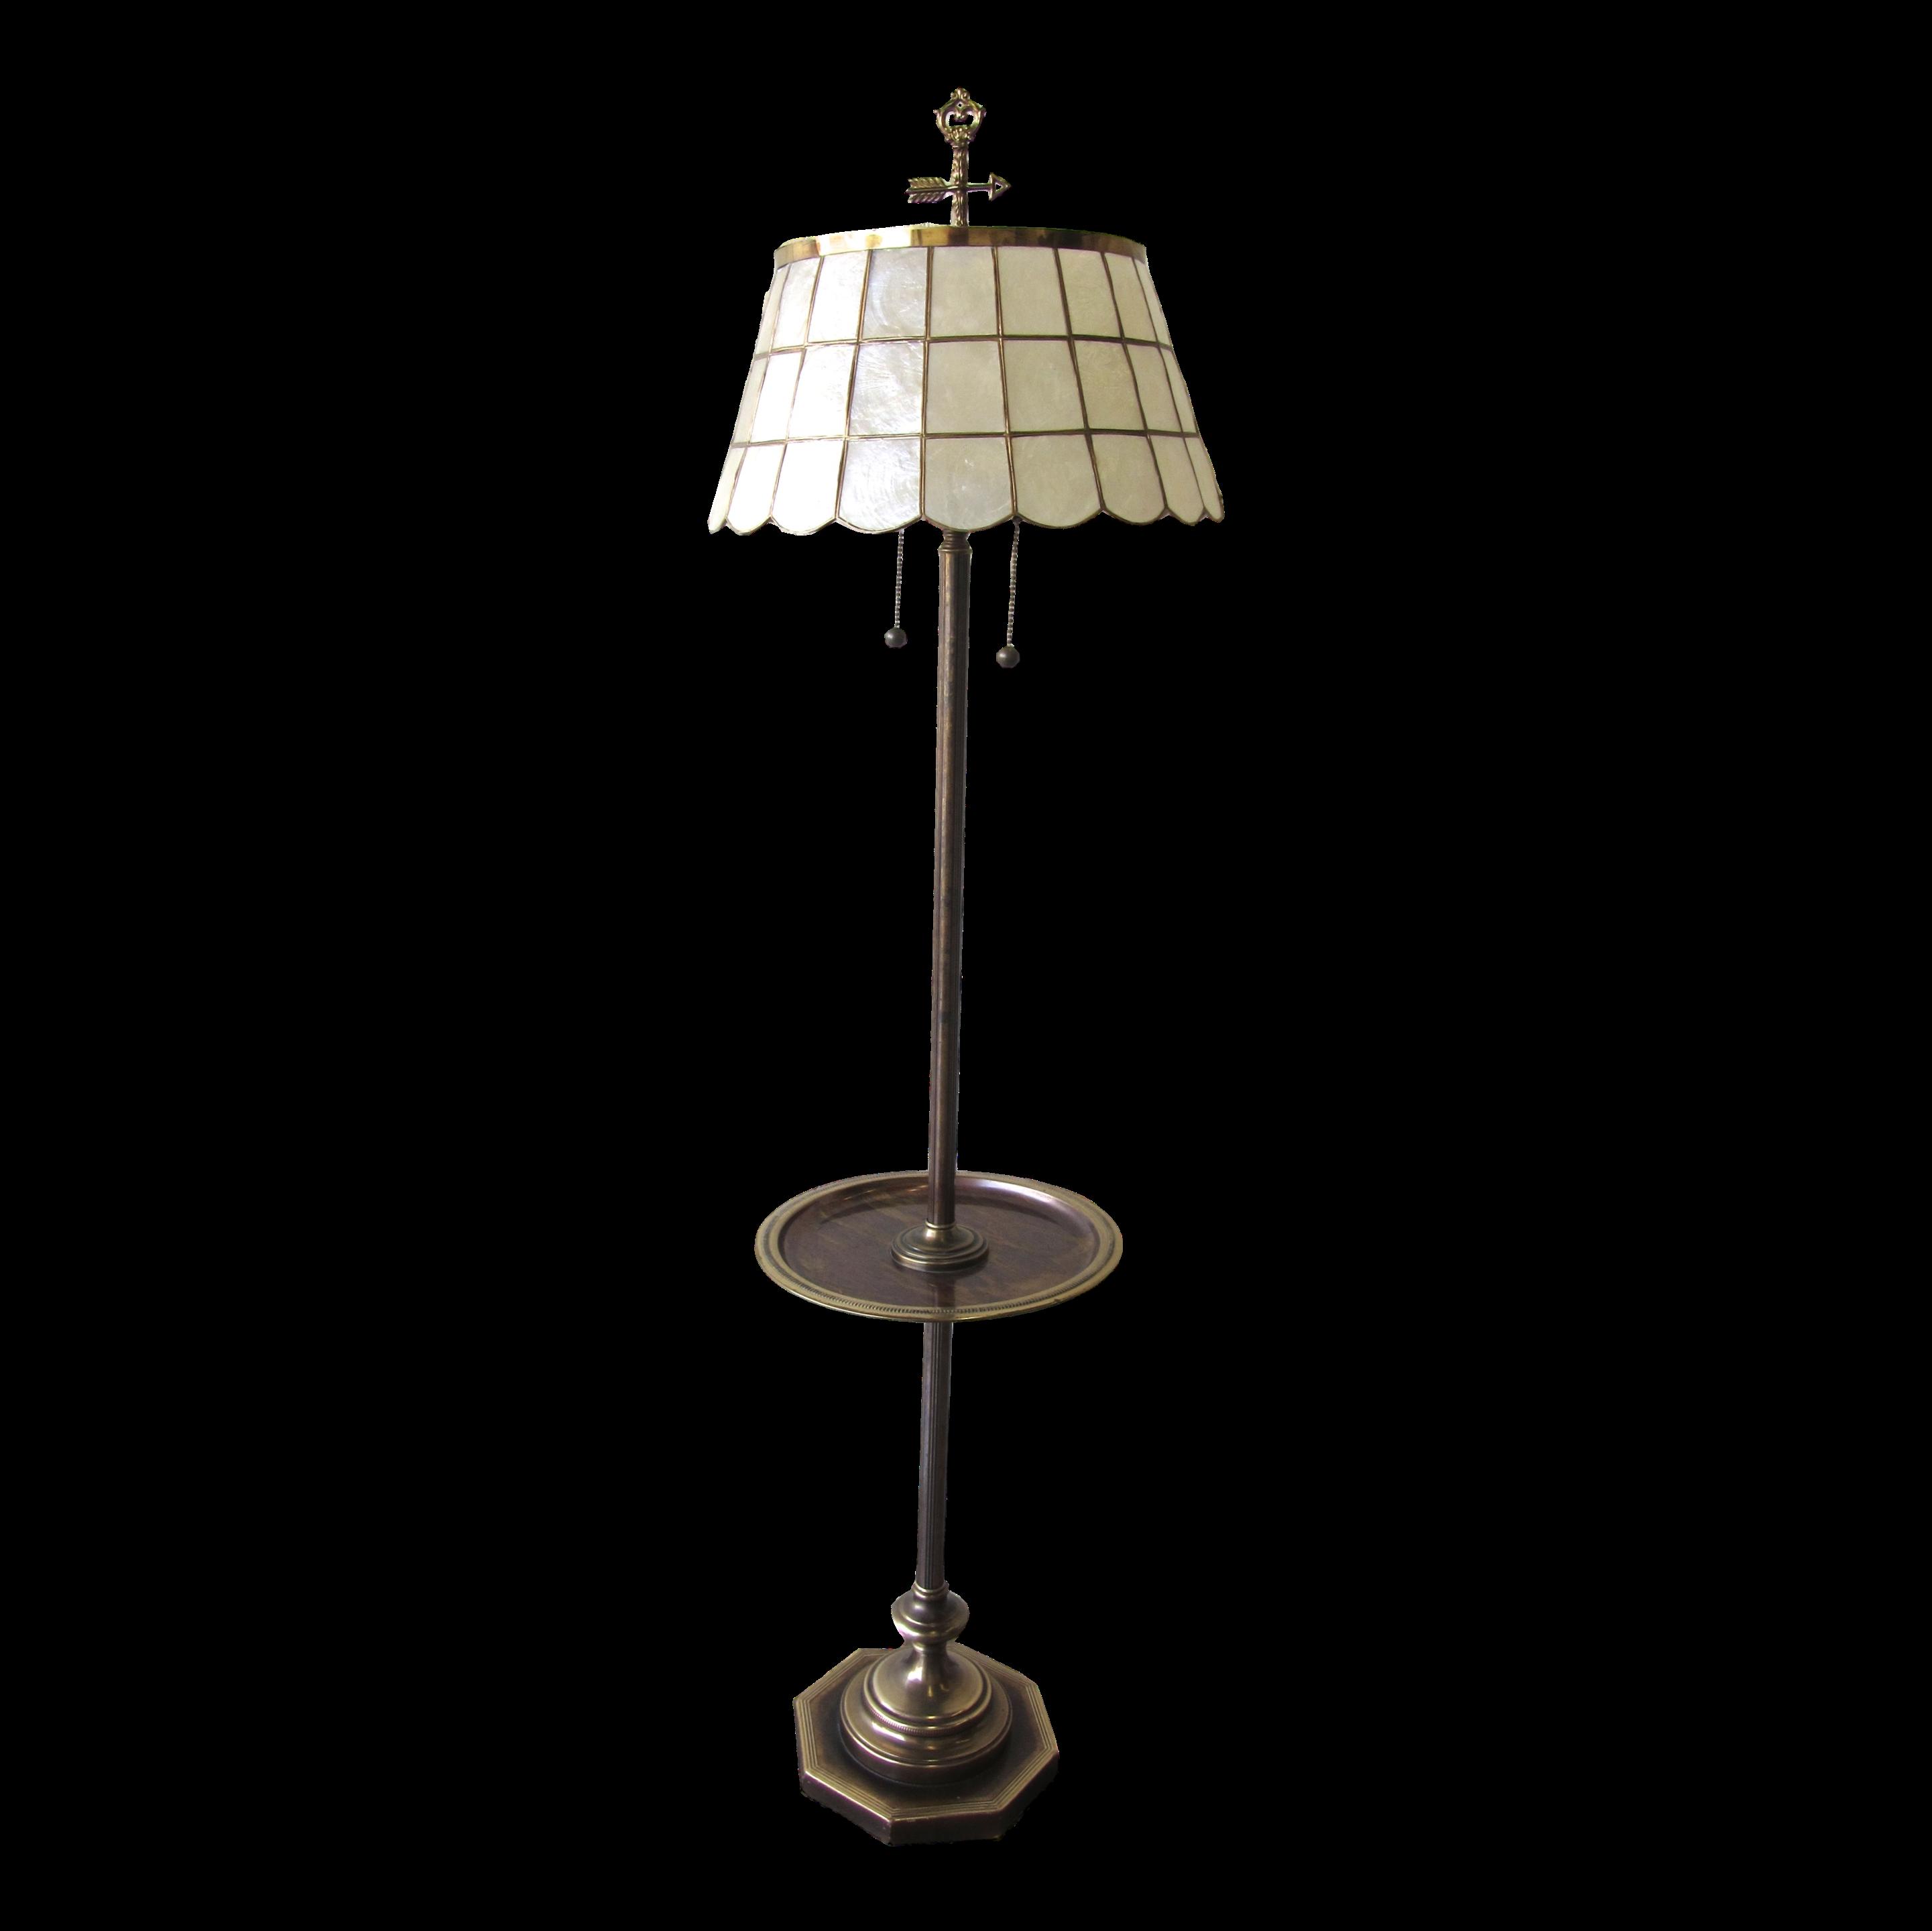 Vintage Brass Floor Lamp With Capiz Shell Shade Brass Floor Lamp Make A Lamp Lamp